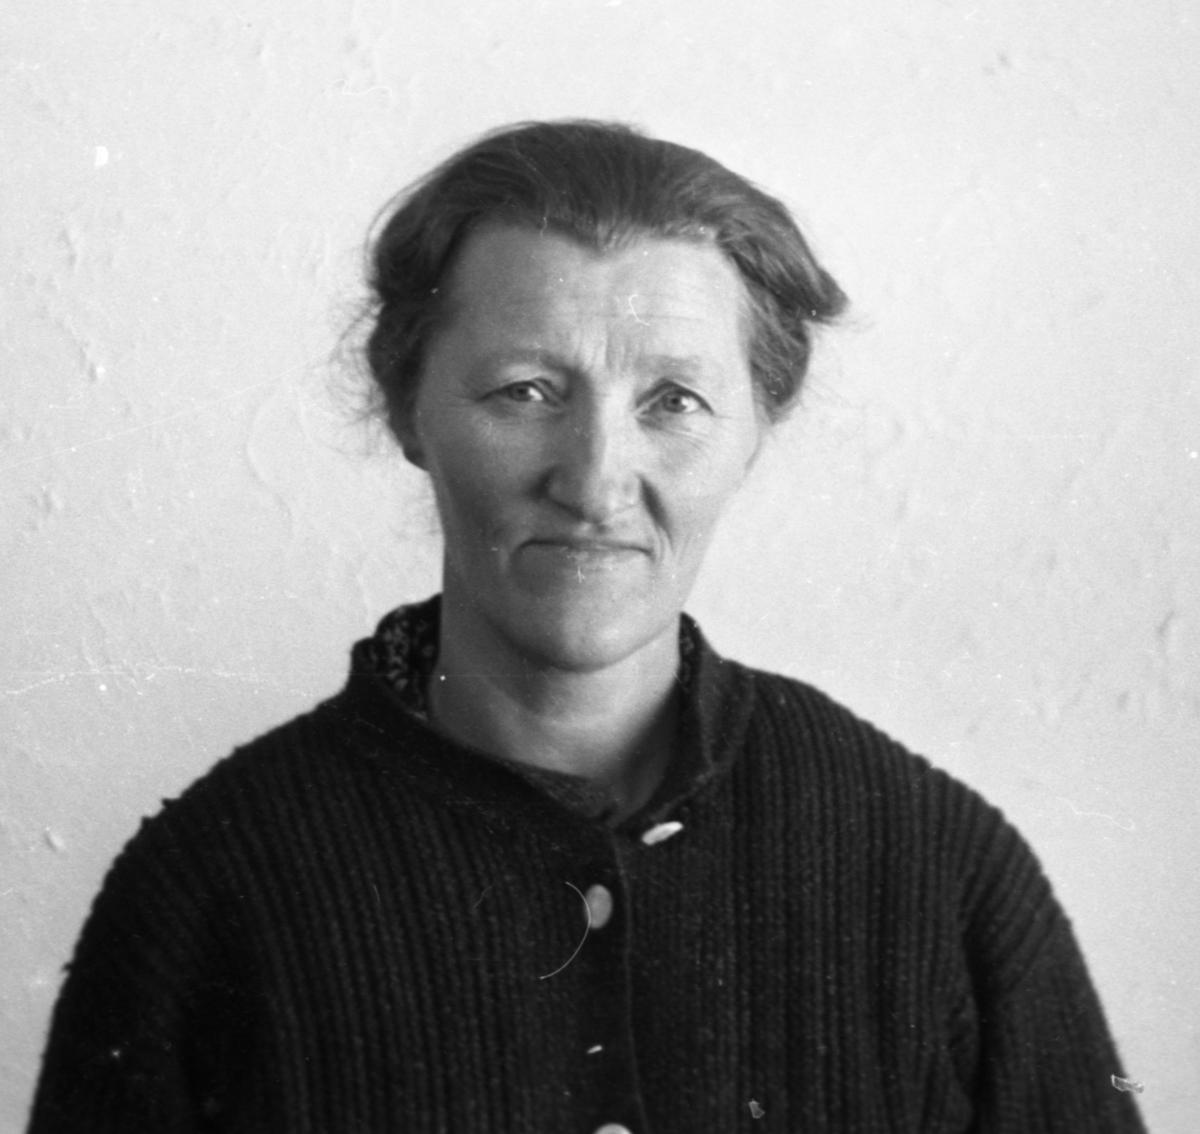 Passbilde av Ingebjørg Blakkestad Haugstad.